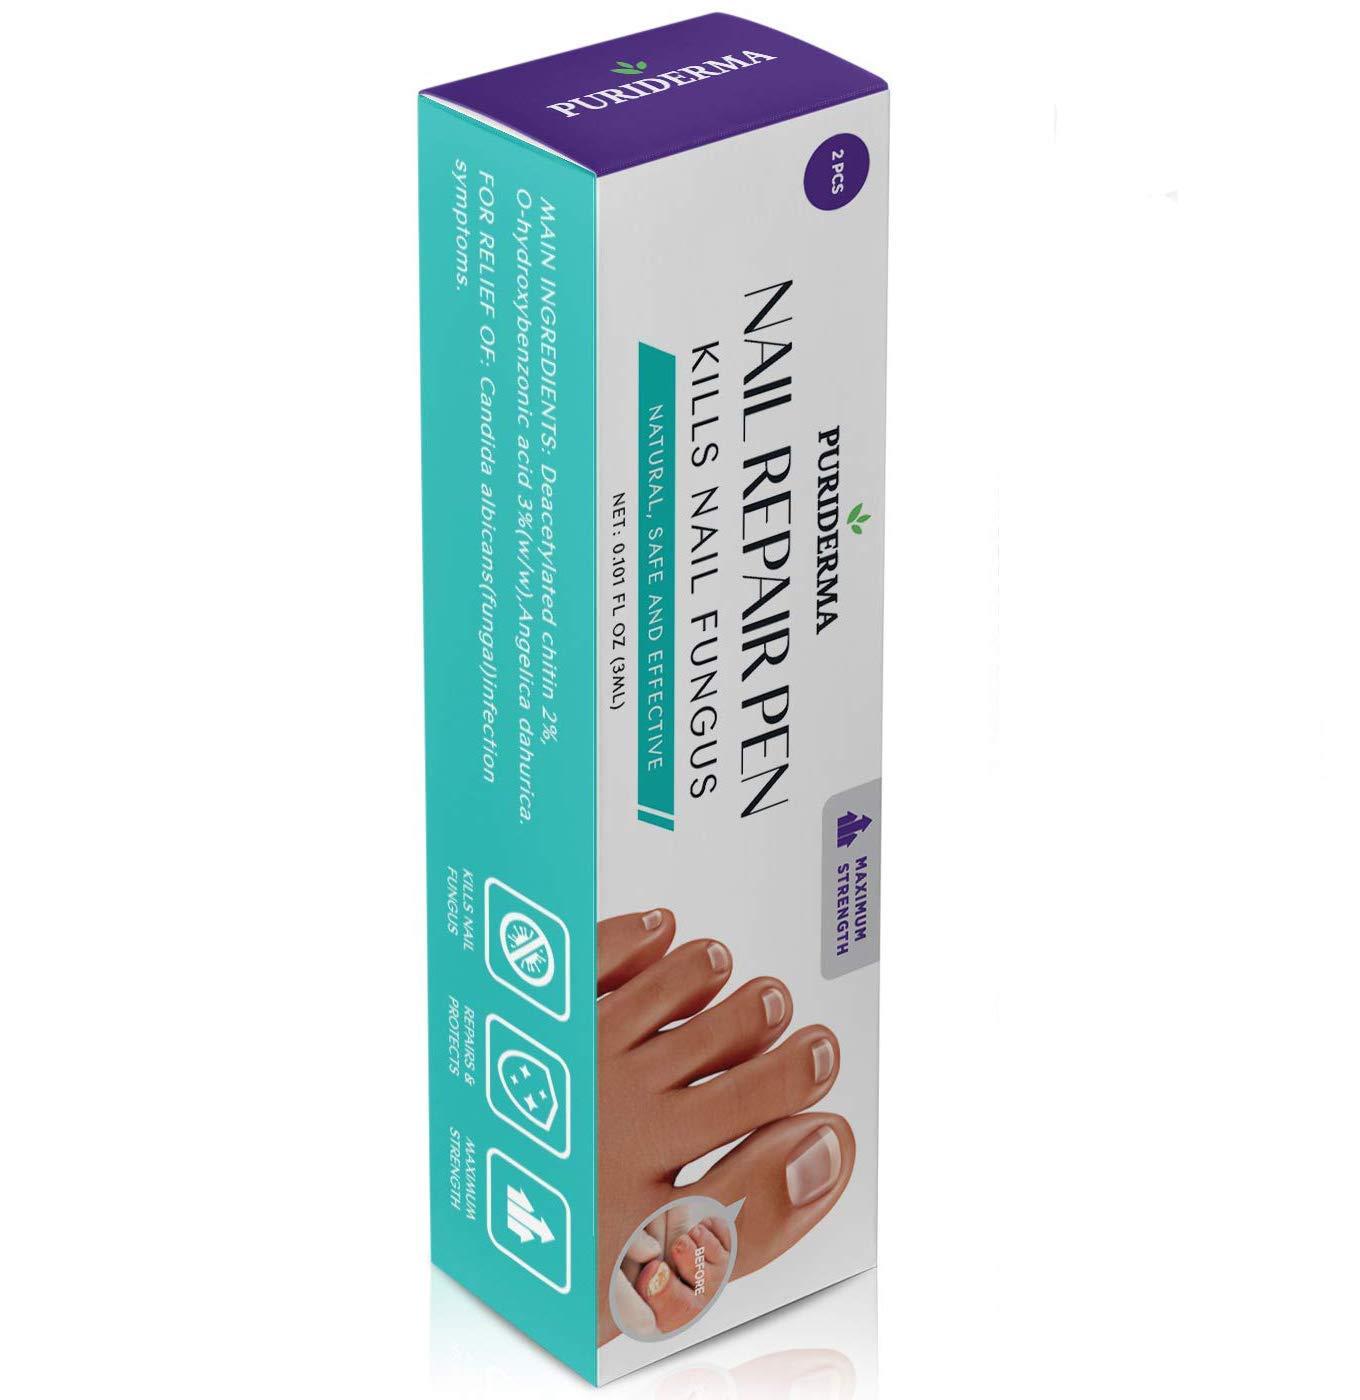 Amazon.com: Wellness Daily tru-organic Cúrcuma Curcumina ...